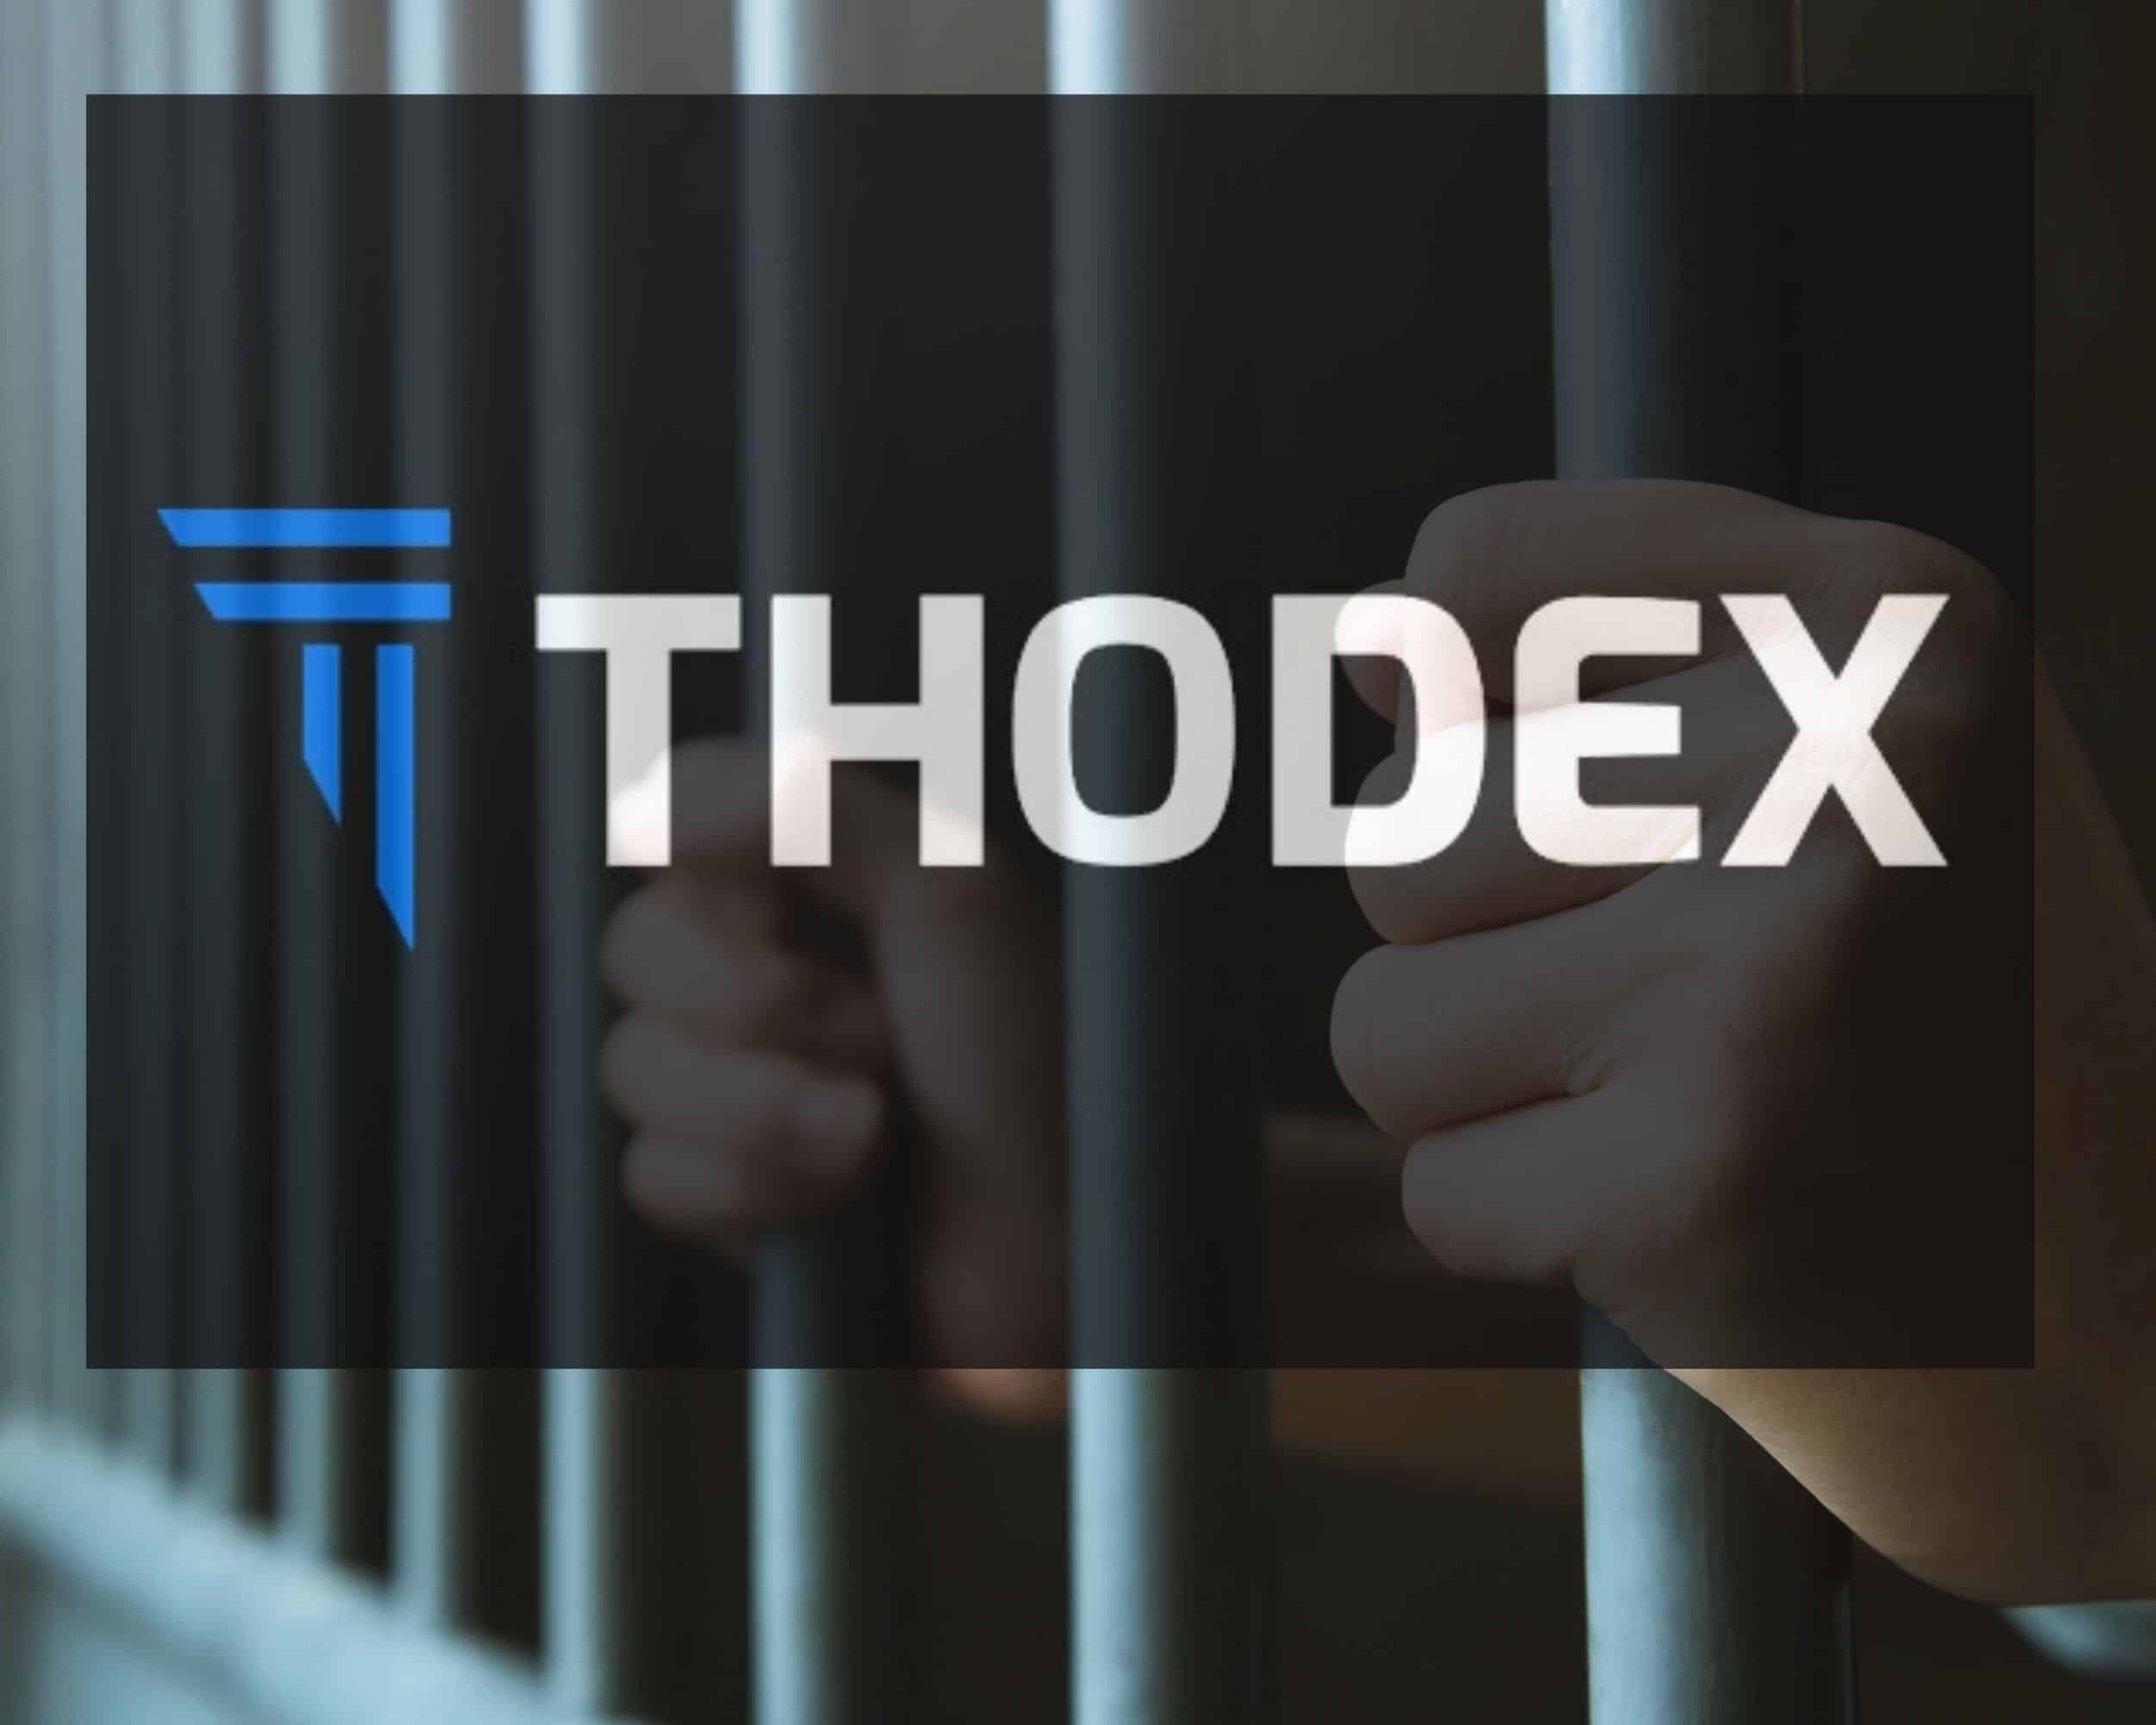 encarcelan a 62 personas de thodex